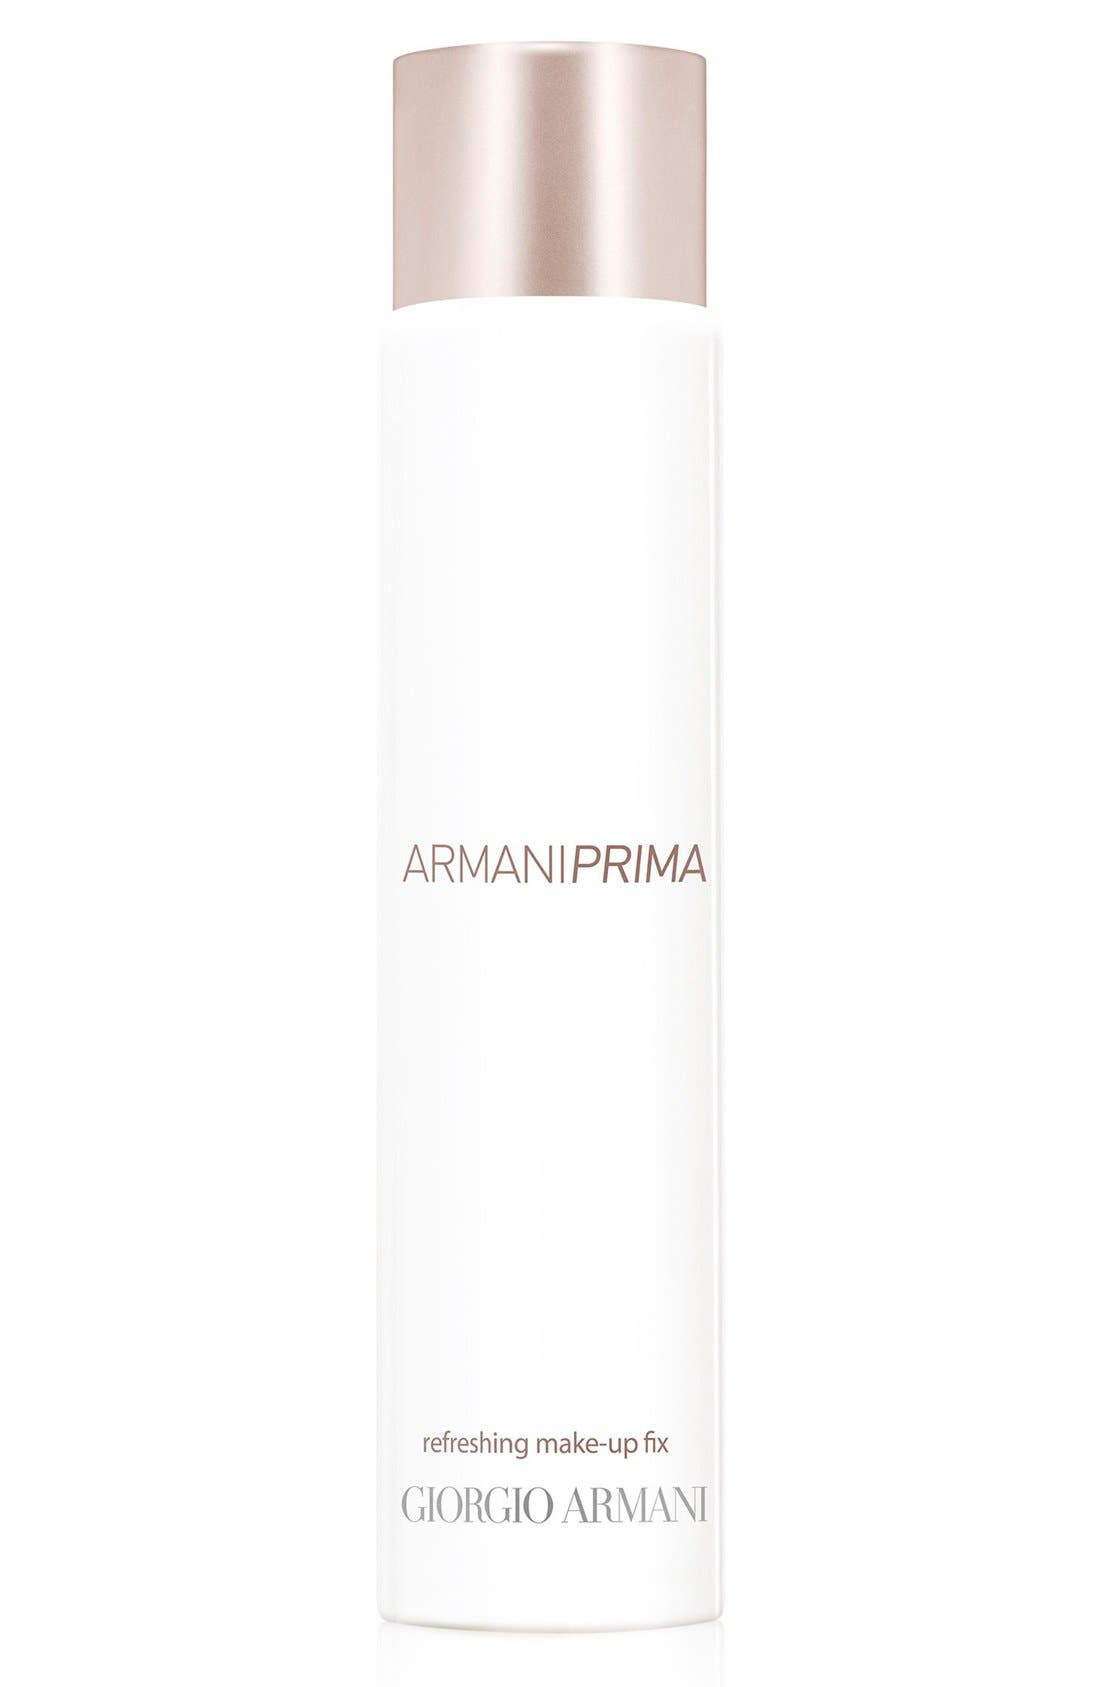 Giorgio Armani 'Prima' Refreshing Makeup Fix